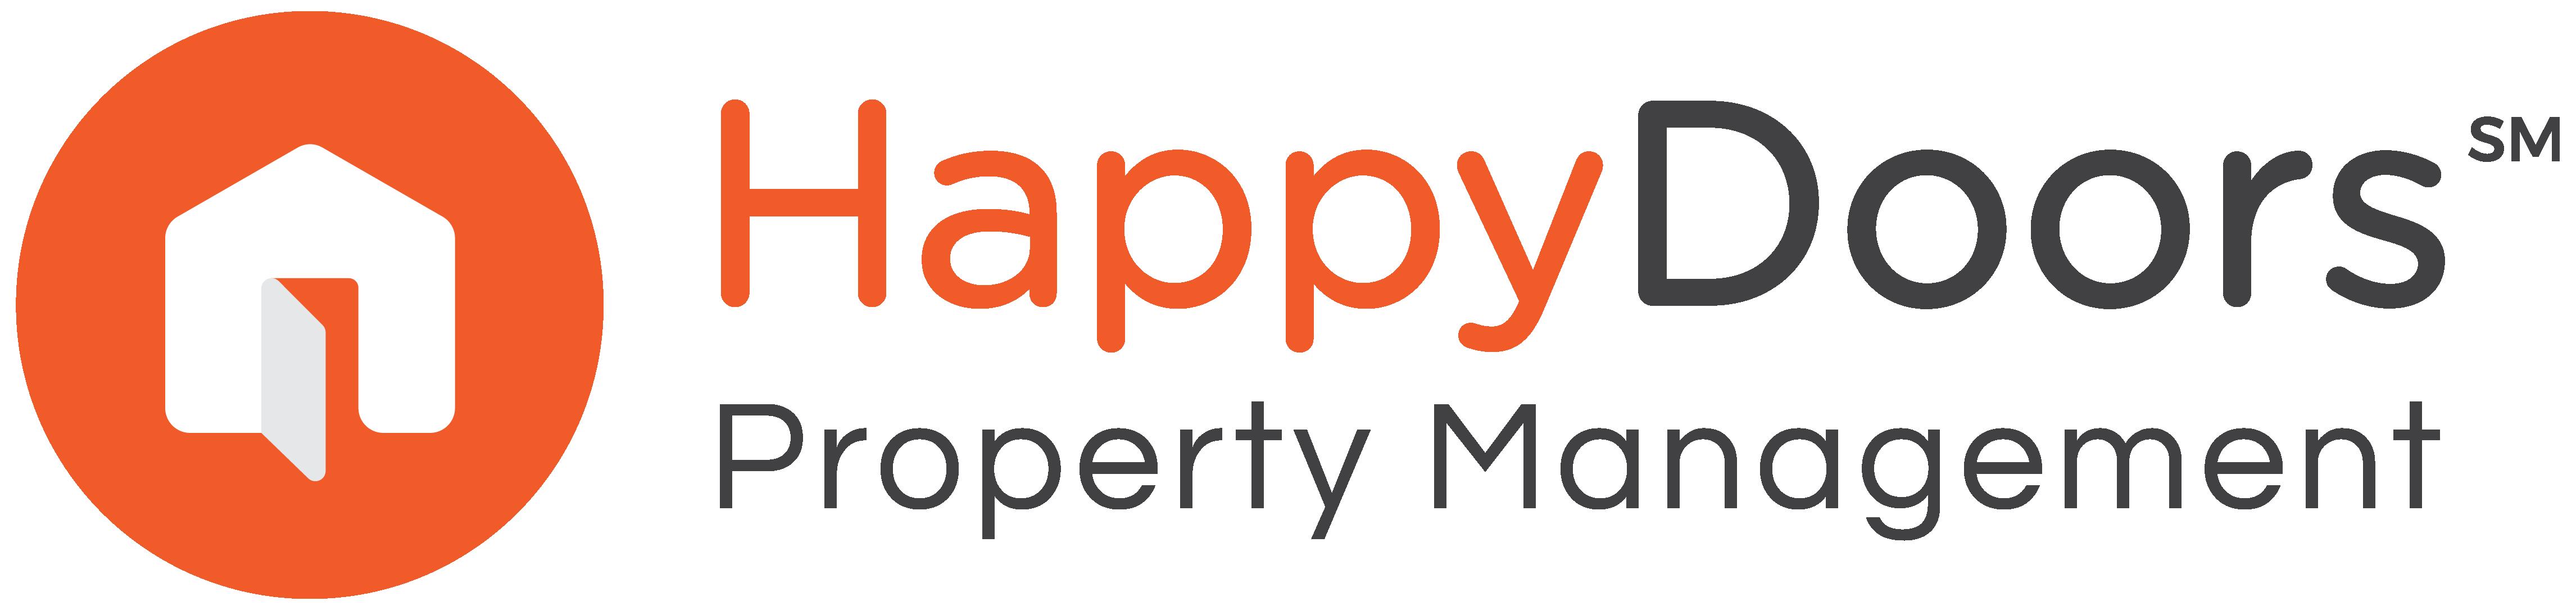 HappyDoors Property Management  sc 1 th 109 & HappyDoors Property Management in Honolulu pezcame.com